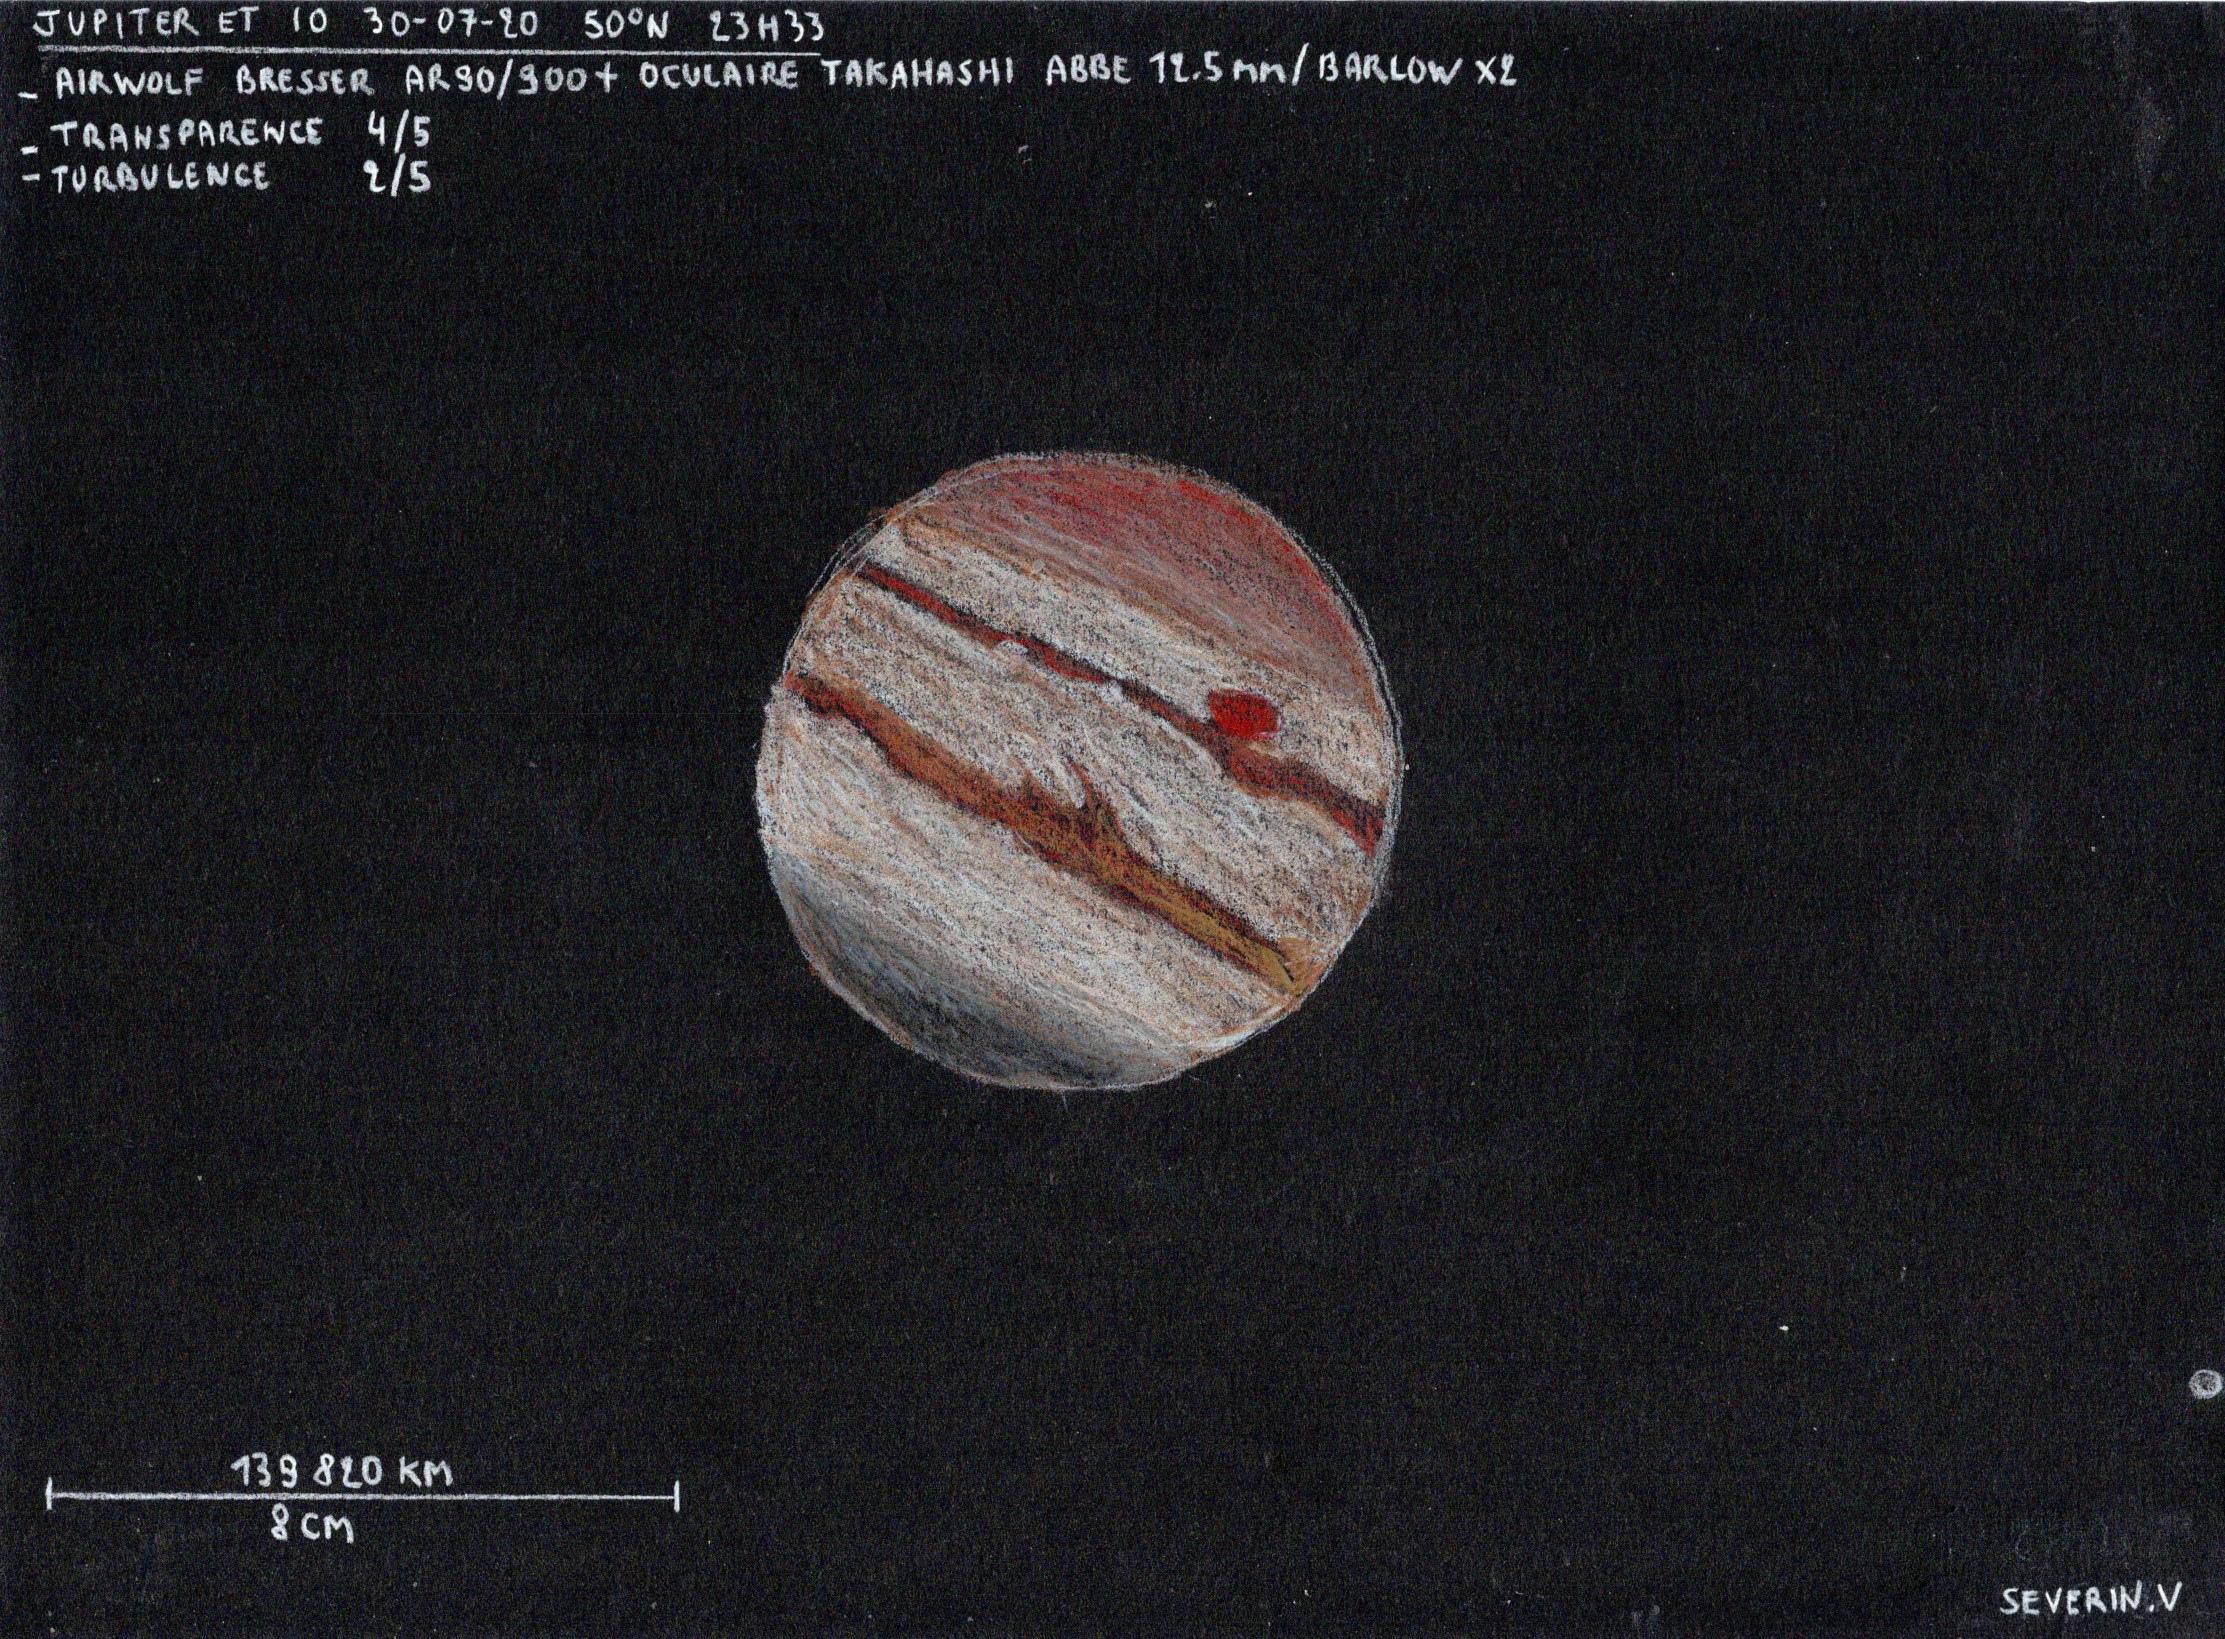 large.JUPITER-30-07-20.jpg.3237d4c3f9570bbe5f987c5d839496b3.jpg